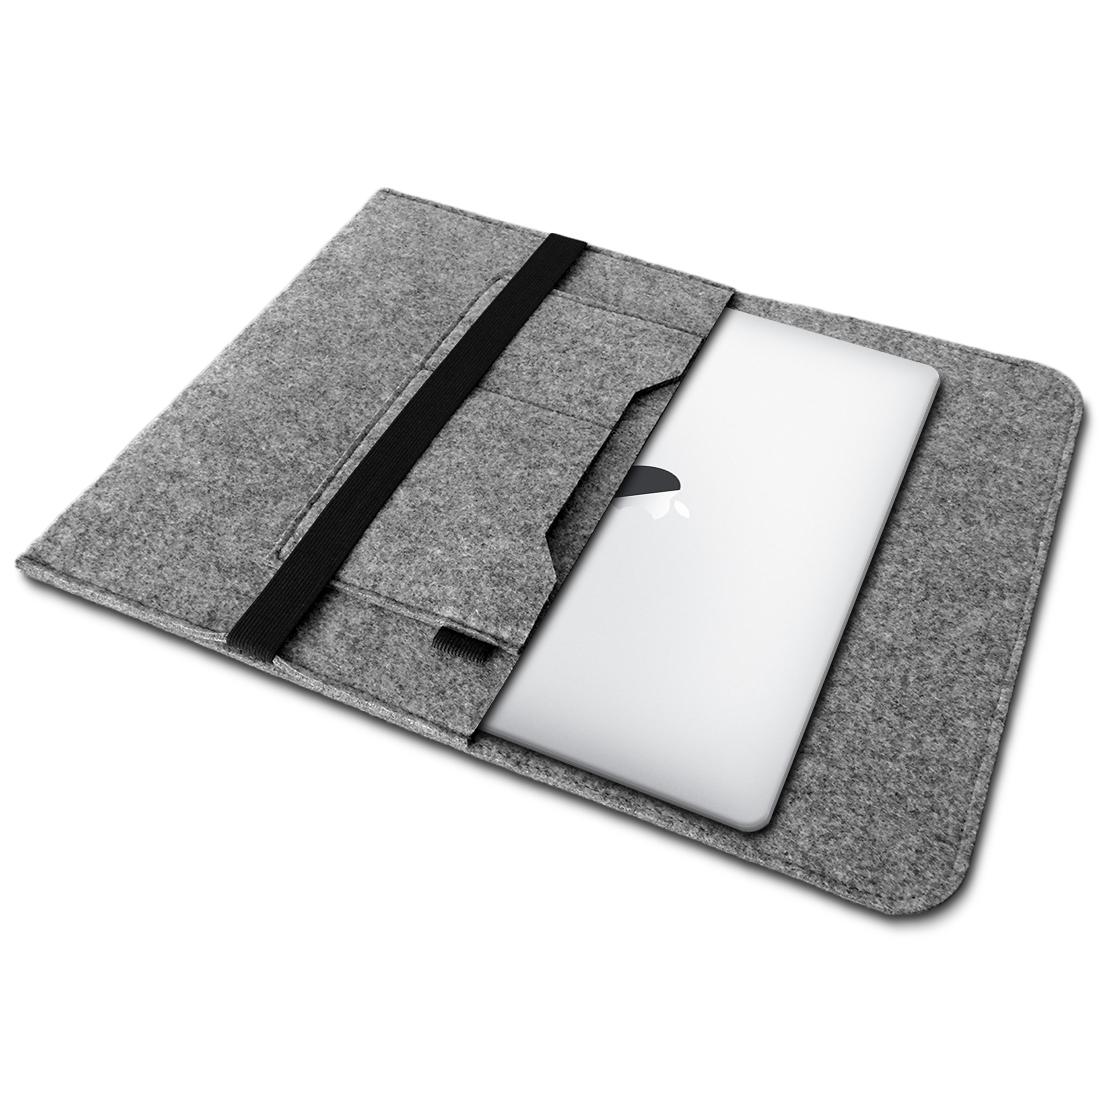 apple macbook pro 13 3 h lle filz grau tasche notebook cover sleeve schutzh lle notebook. Black Bedroom Furniture Sets. Home Design Ideas